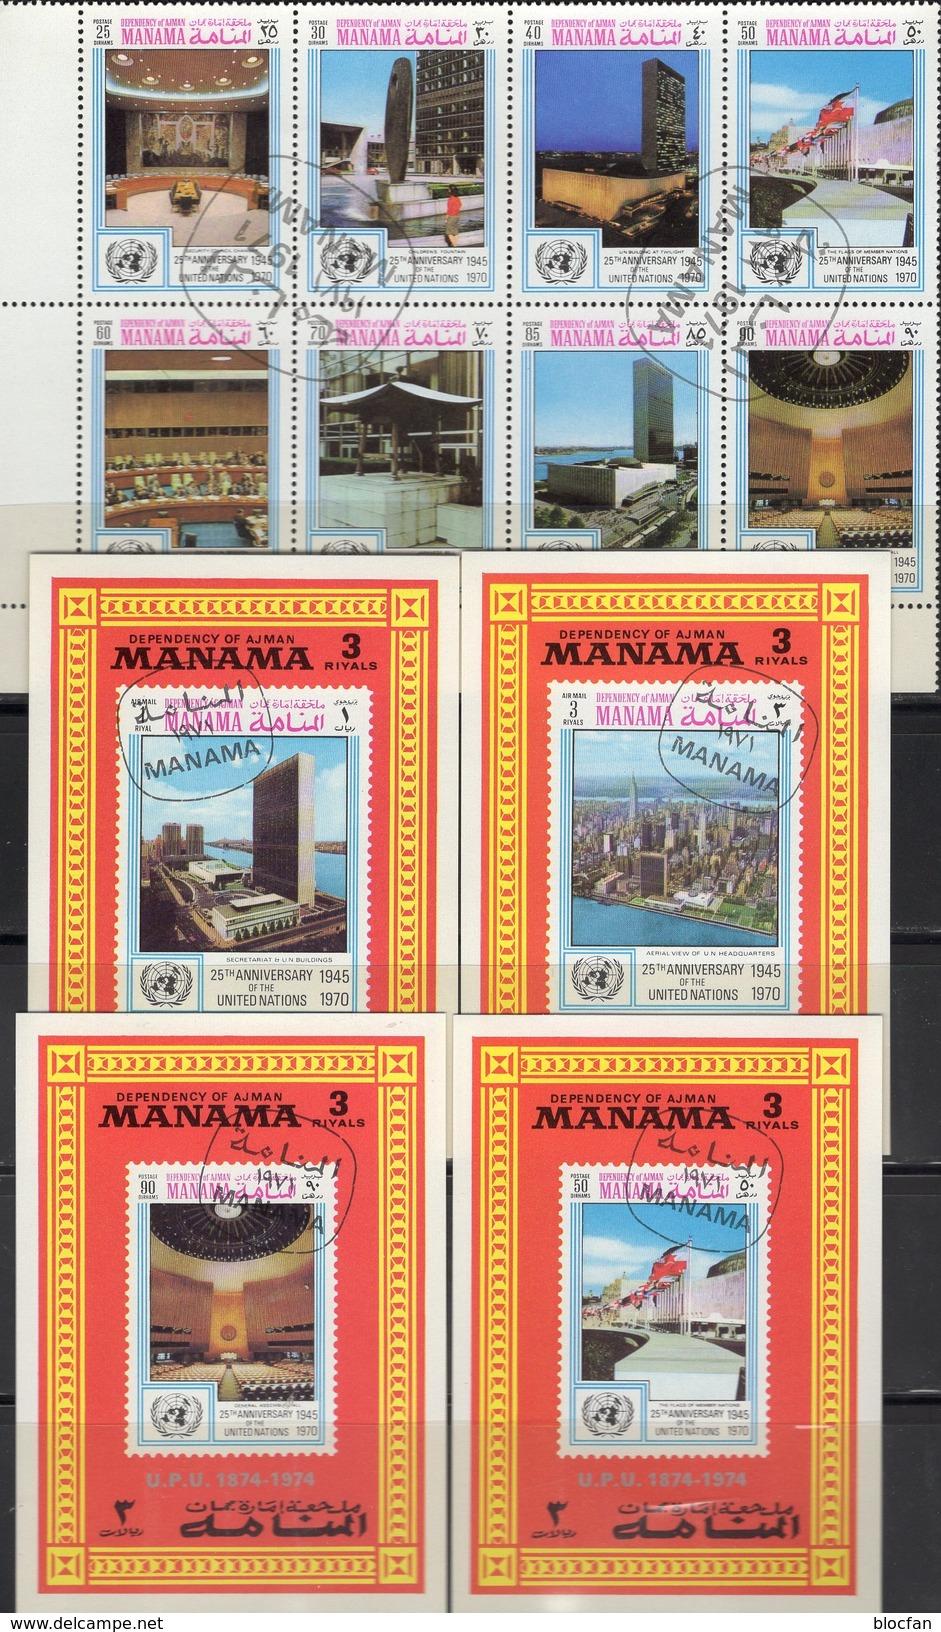 Flaggen UNO 1971 Manama 535-542 KB+Blocks A-D 107 O 24€ 25 Jahre UN NY Hojitas EXPO Blocs Flags Sheets Bf VAE Ajman - Manama